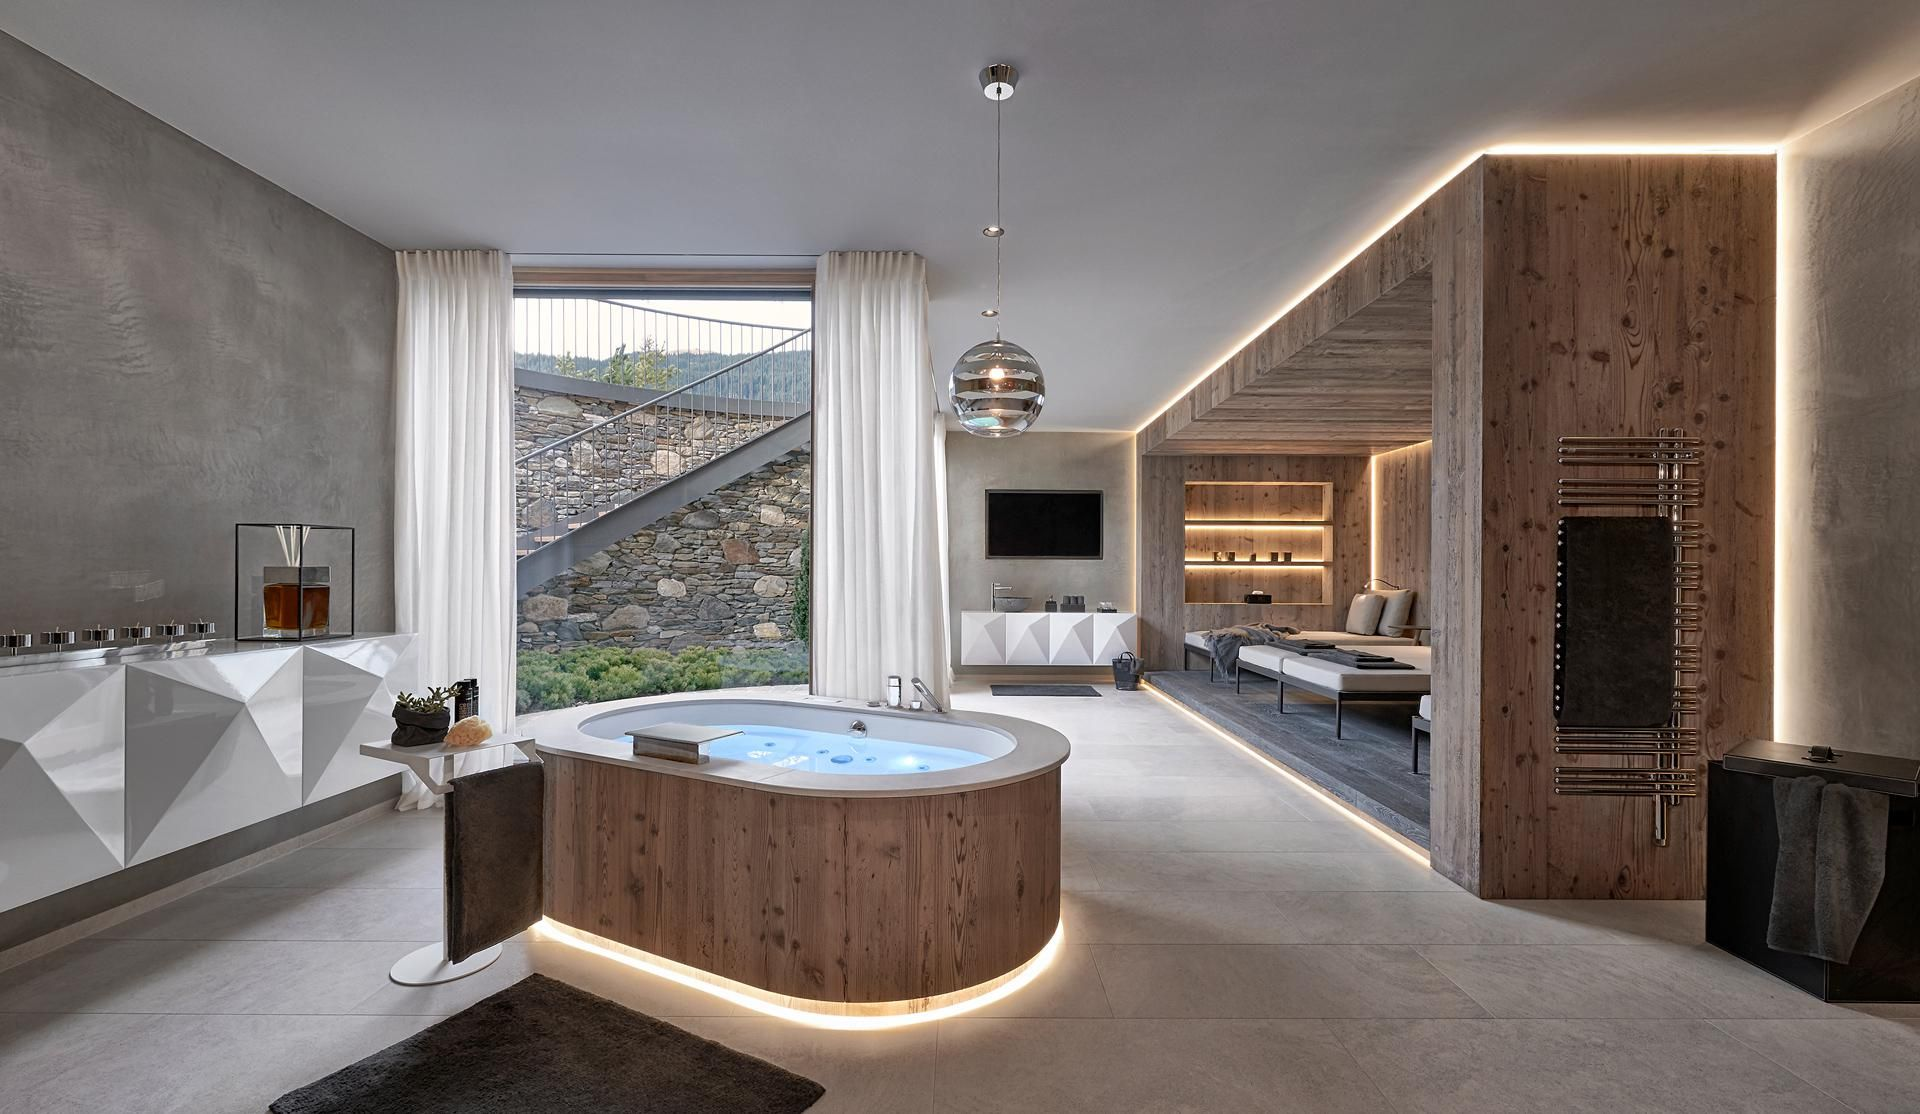 Wonderful Gasteiger Bad / Kitzbühel / Wellness   Sauna, Dampfbad, Schwimmbad U0026  Whirlpool